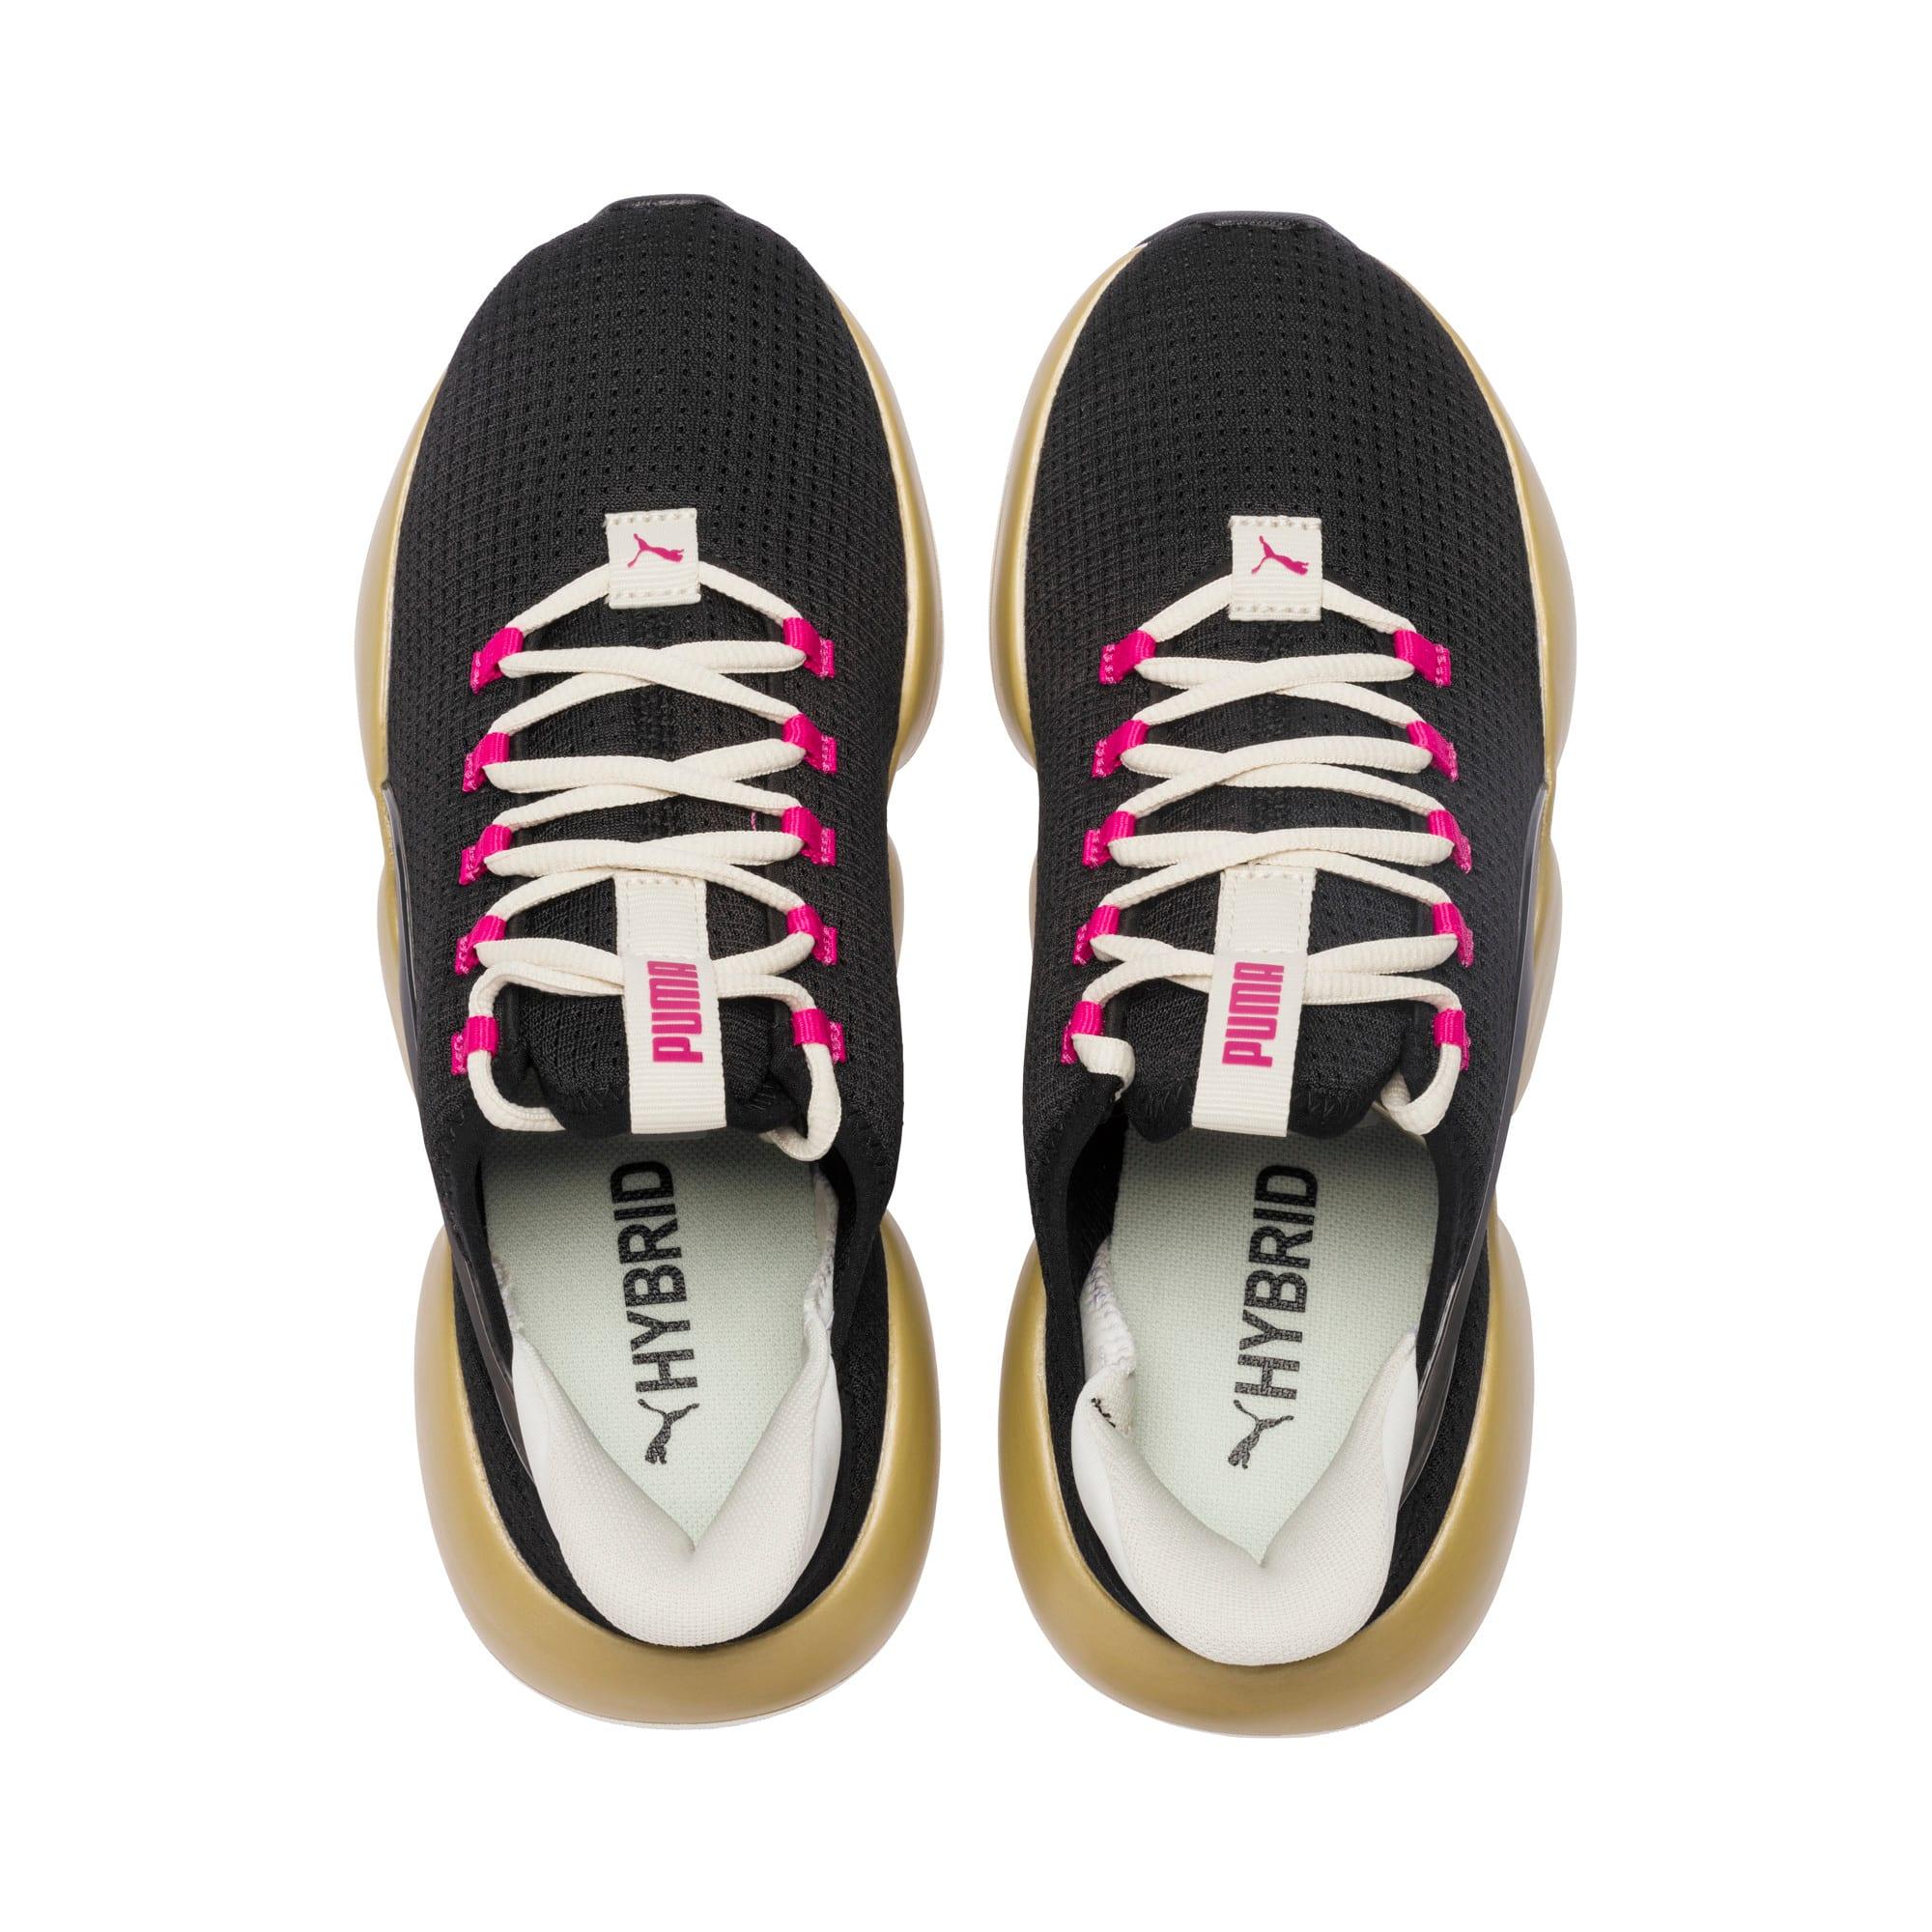 Thumbnail 6 of Mode XT Sweet Damen Sneaker, Black- White-Purple, medium